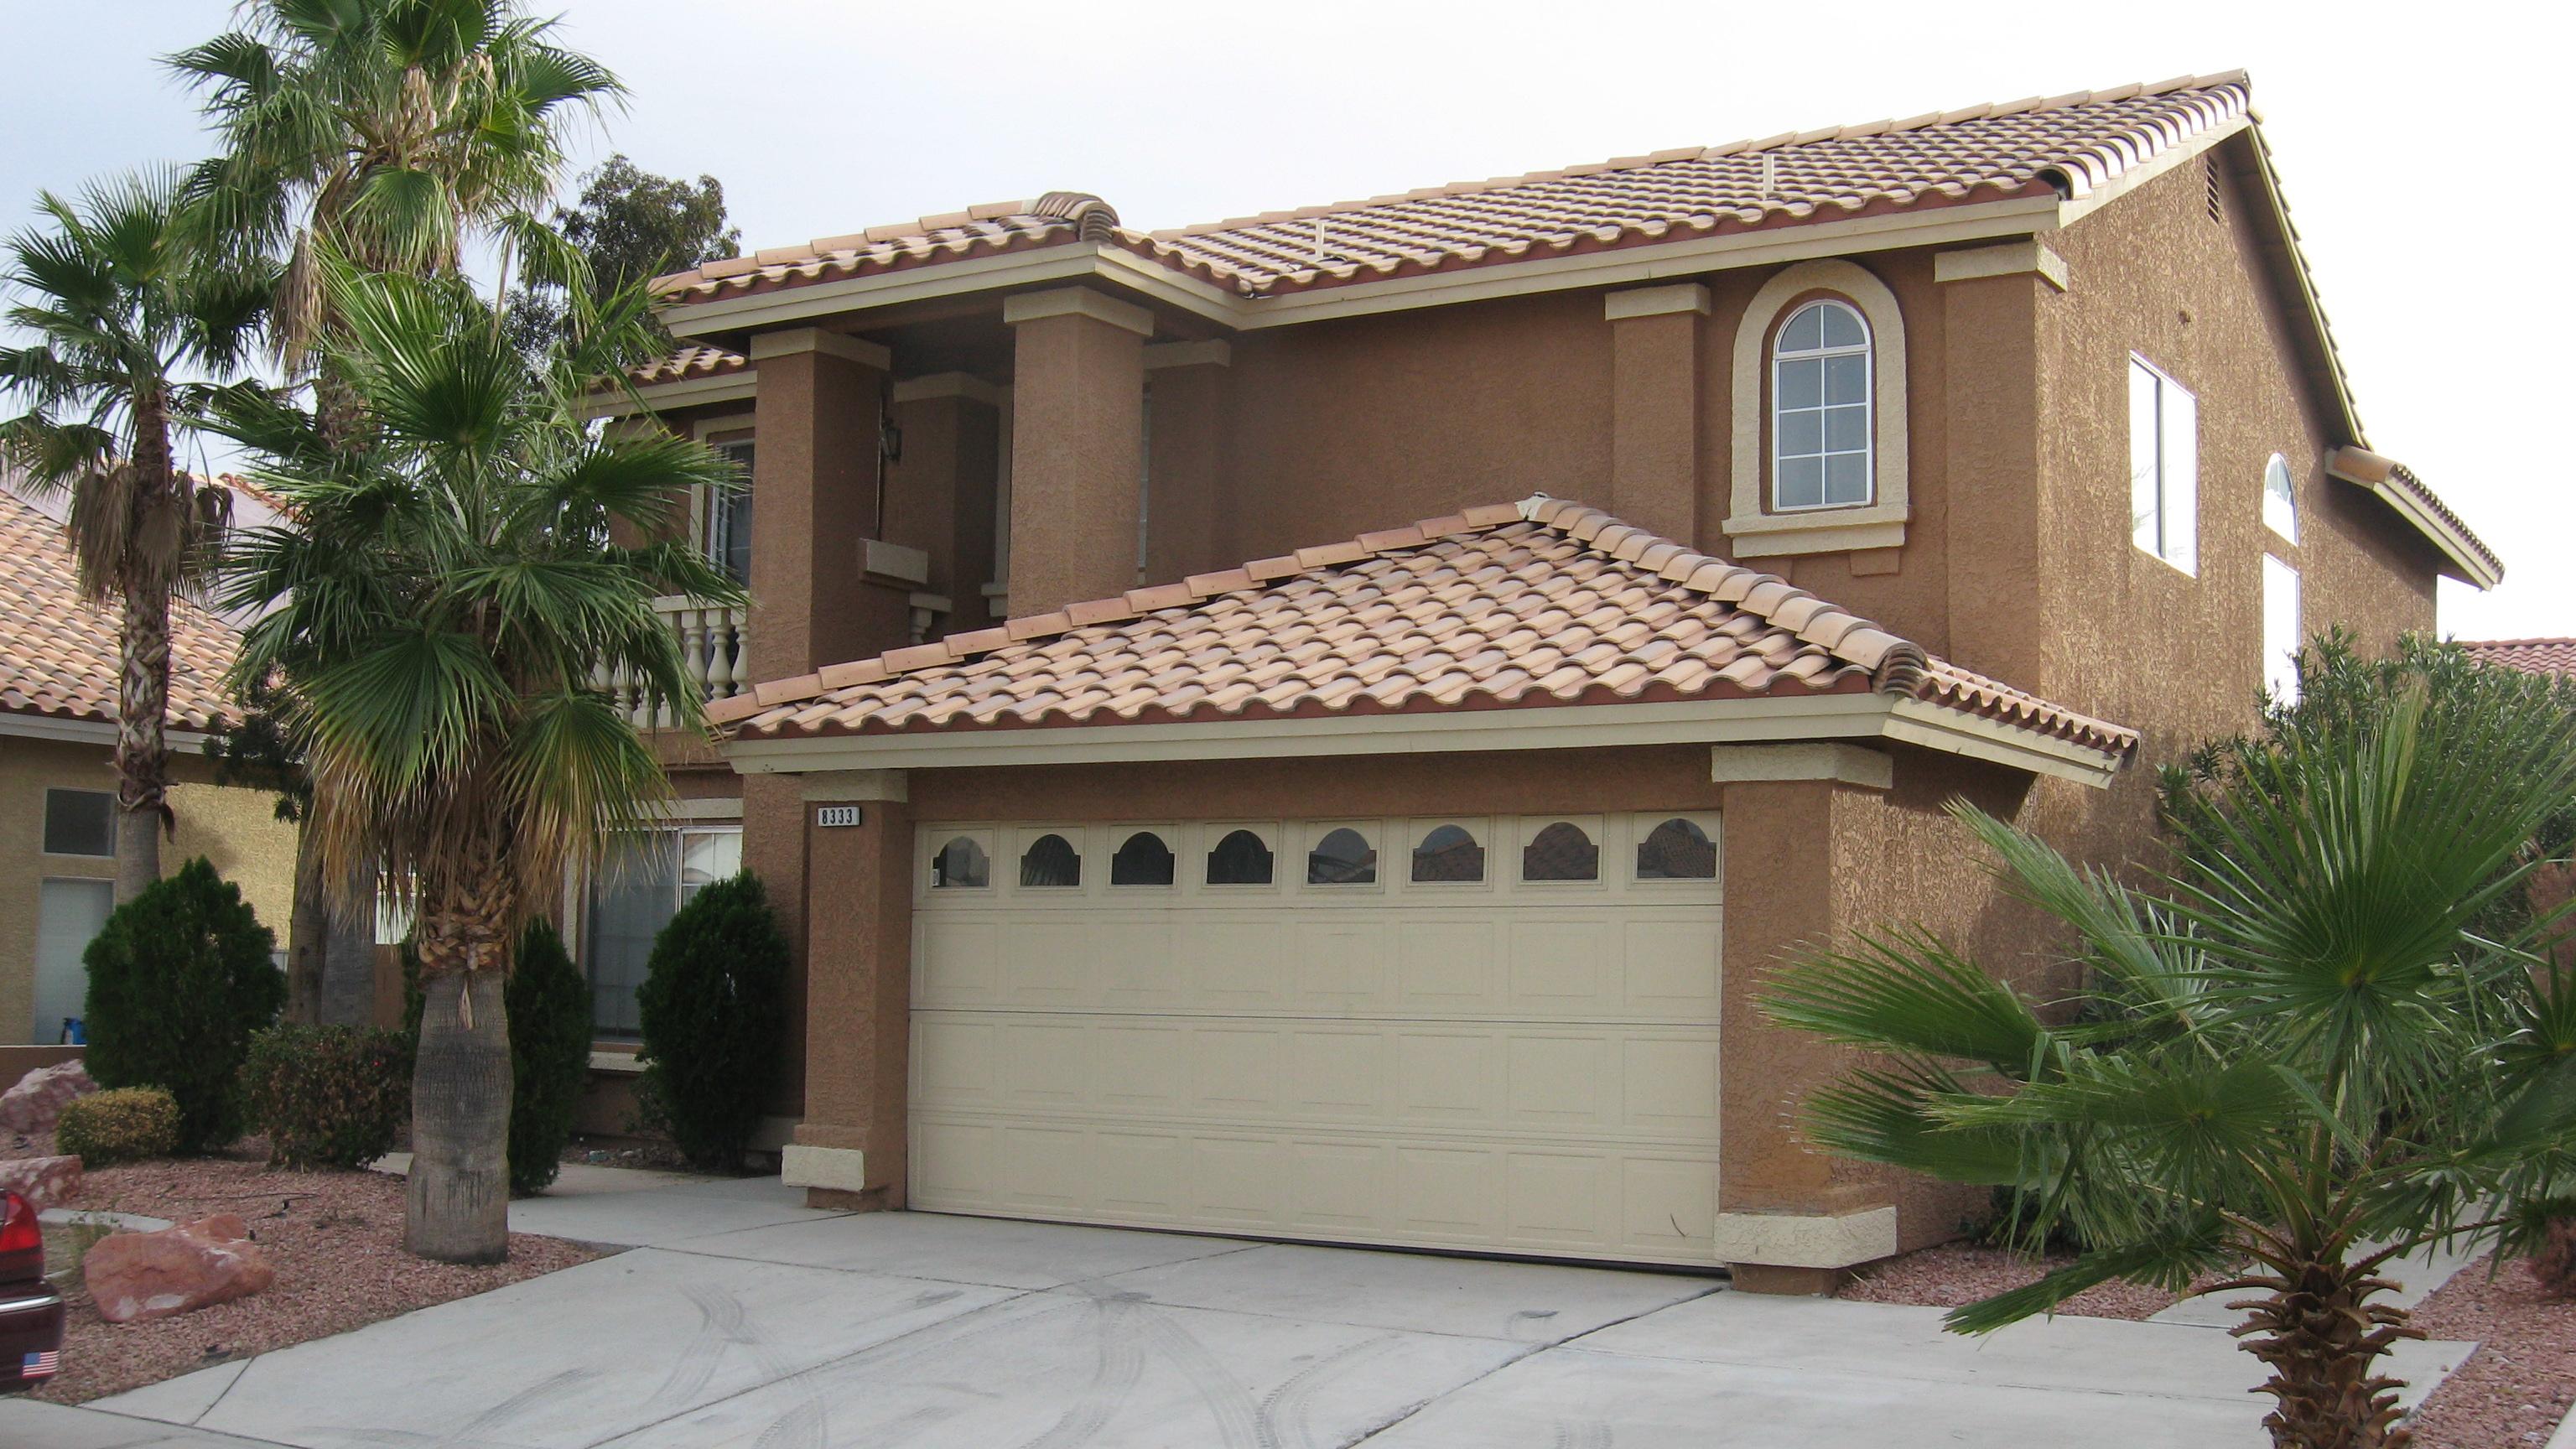 8333 Emerald Isle Ave, Las Vegas, NV 89128